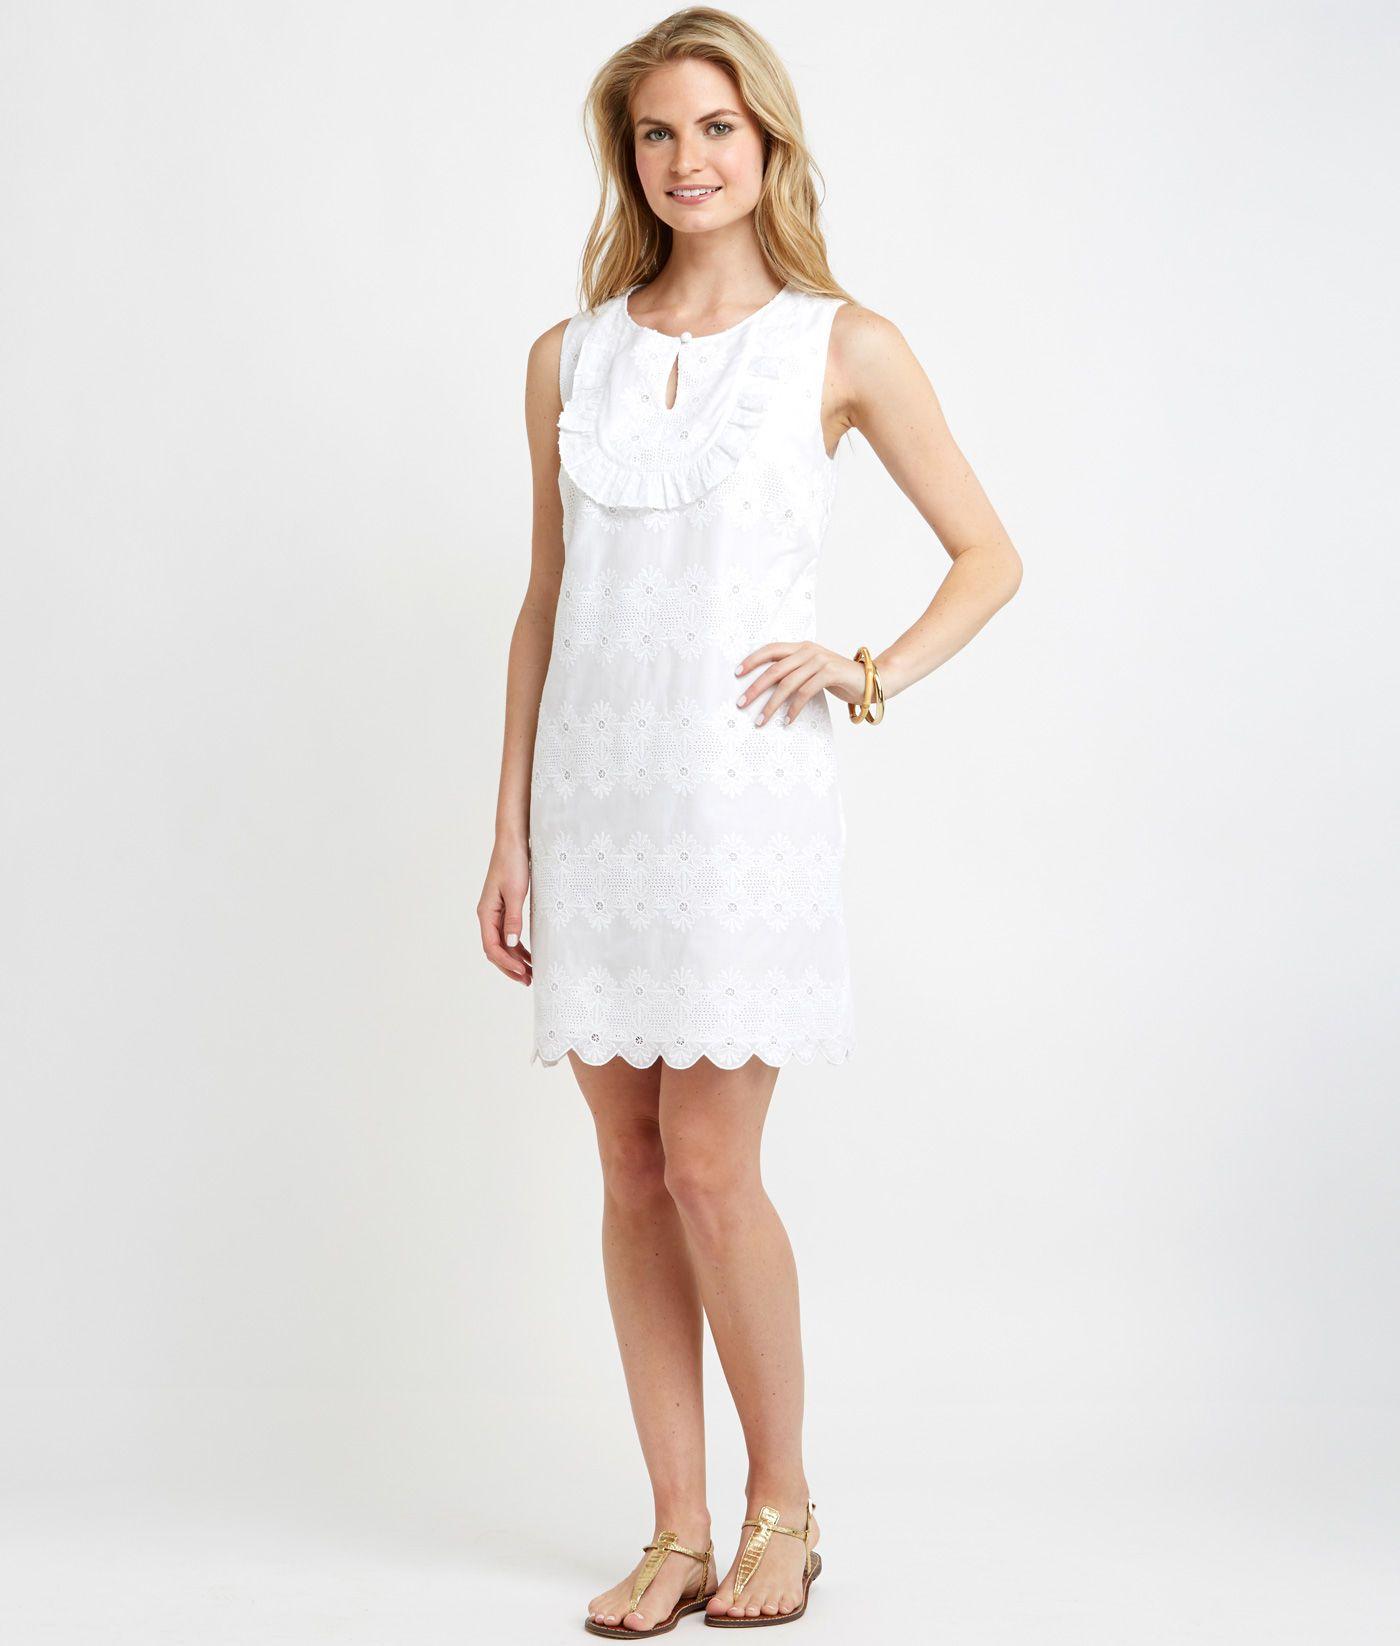 Shop Eyelet Ruffle Shift Dress At Vineyard Vines Dresses Shift Dress Little White Dresses [ 1646 x 1400 Pixel ]